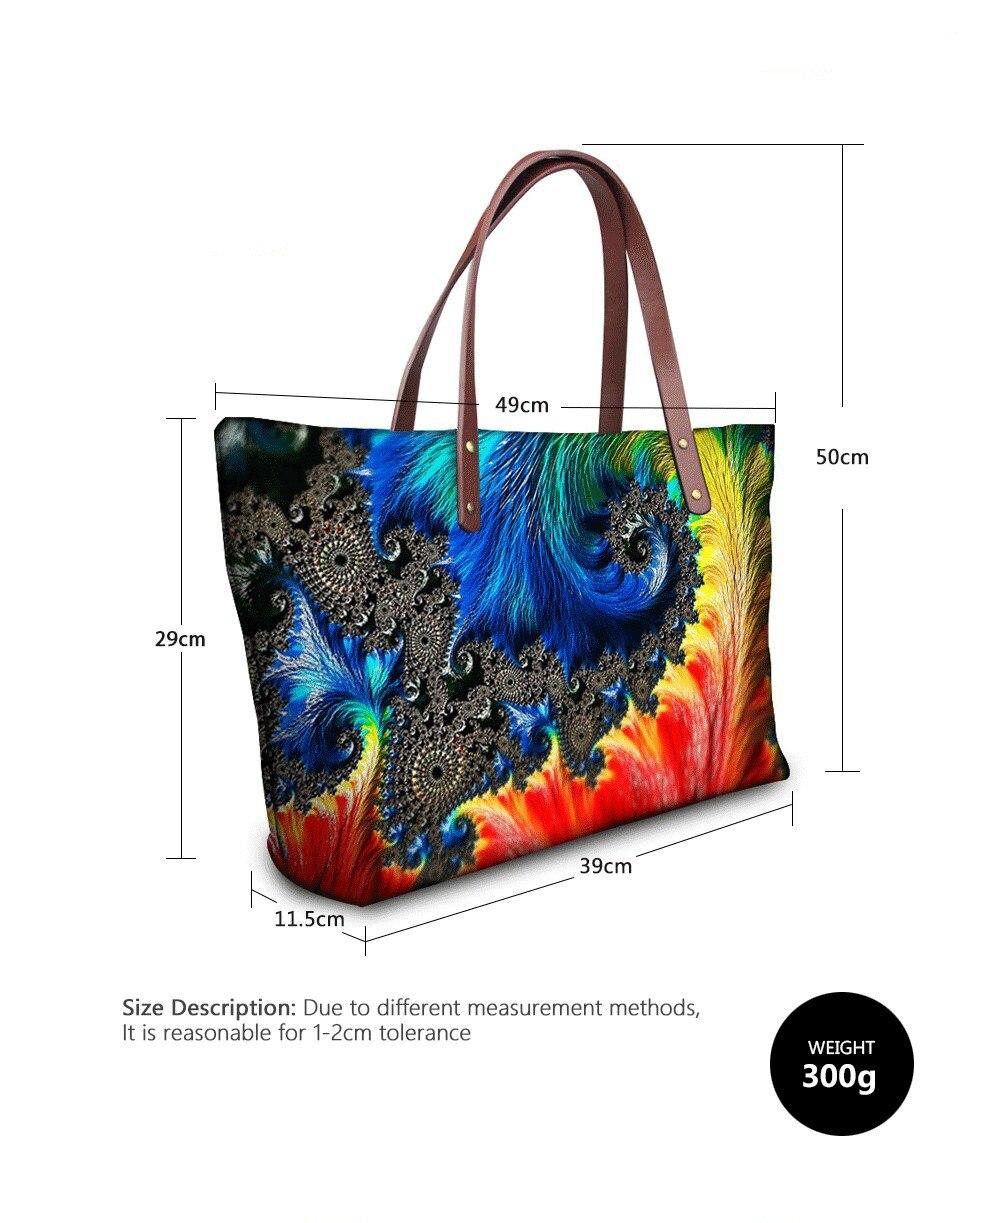 FORUDESIGNS Avocado Printing Women Handbag&Long Wallets Set  Large Bolso Mujer Mochila De Aguacate Sac a dos рюкзак с авокадо